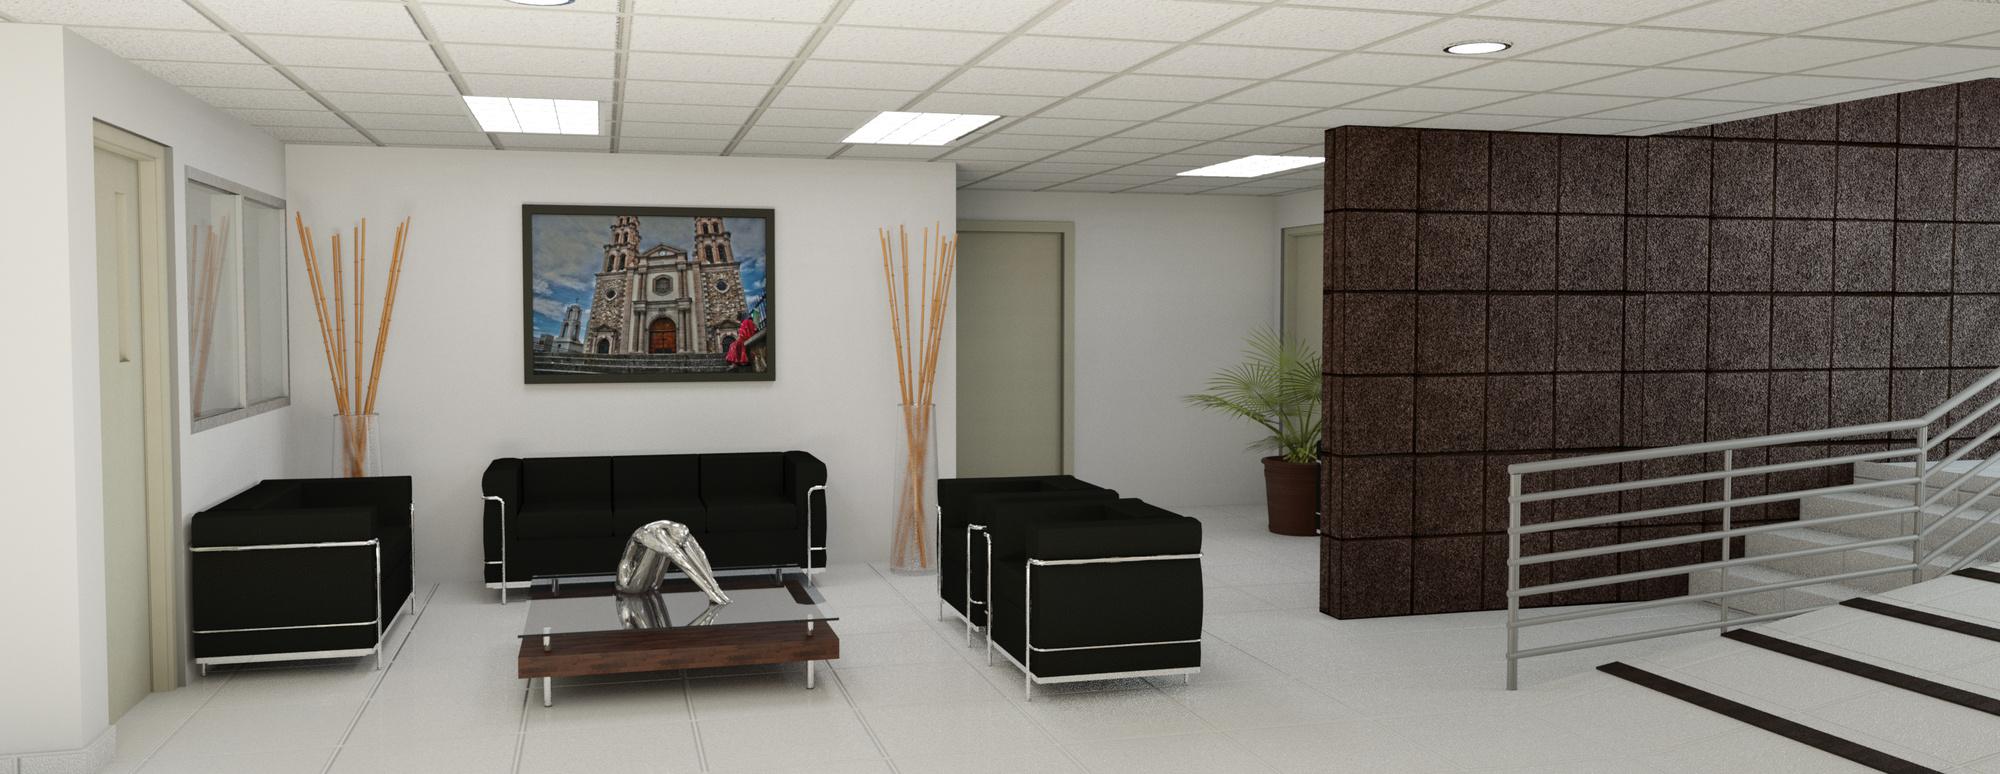 Raas-rendering20150112-13614-d79miq